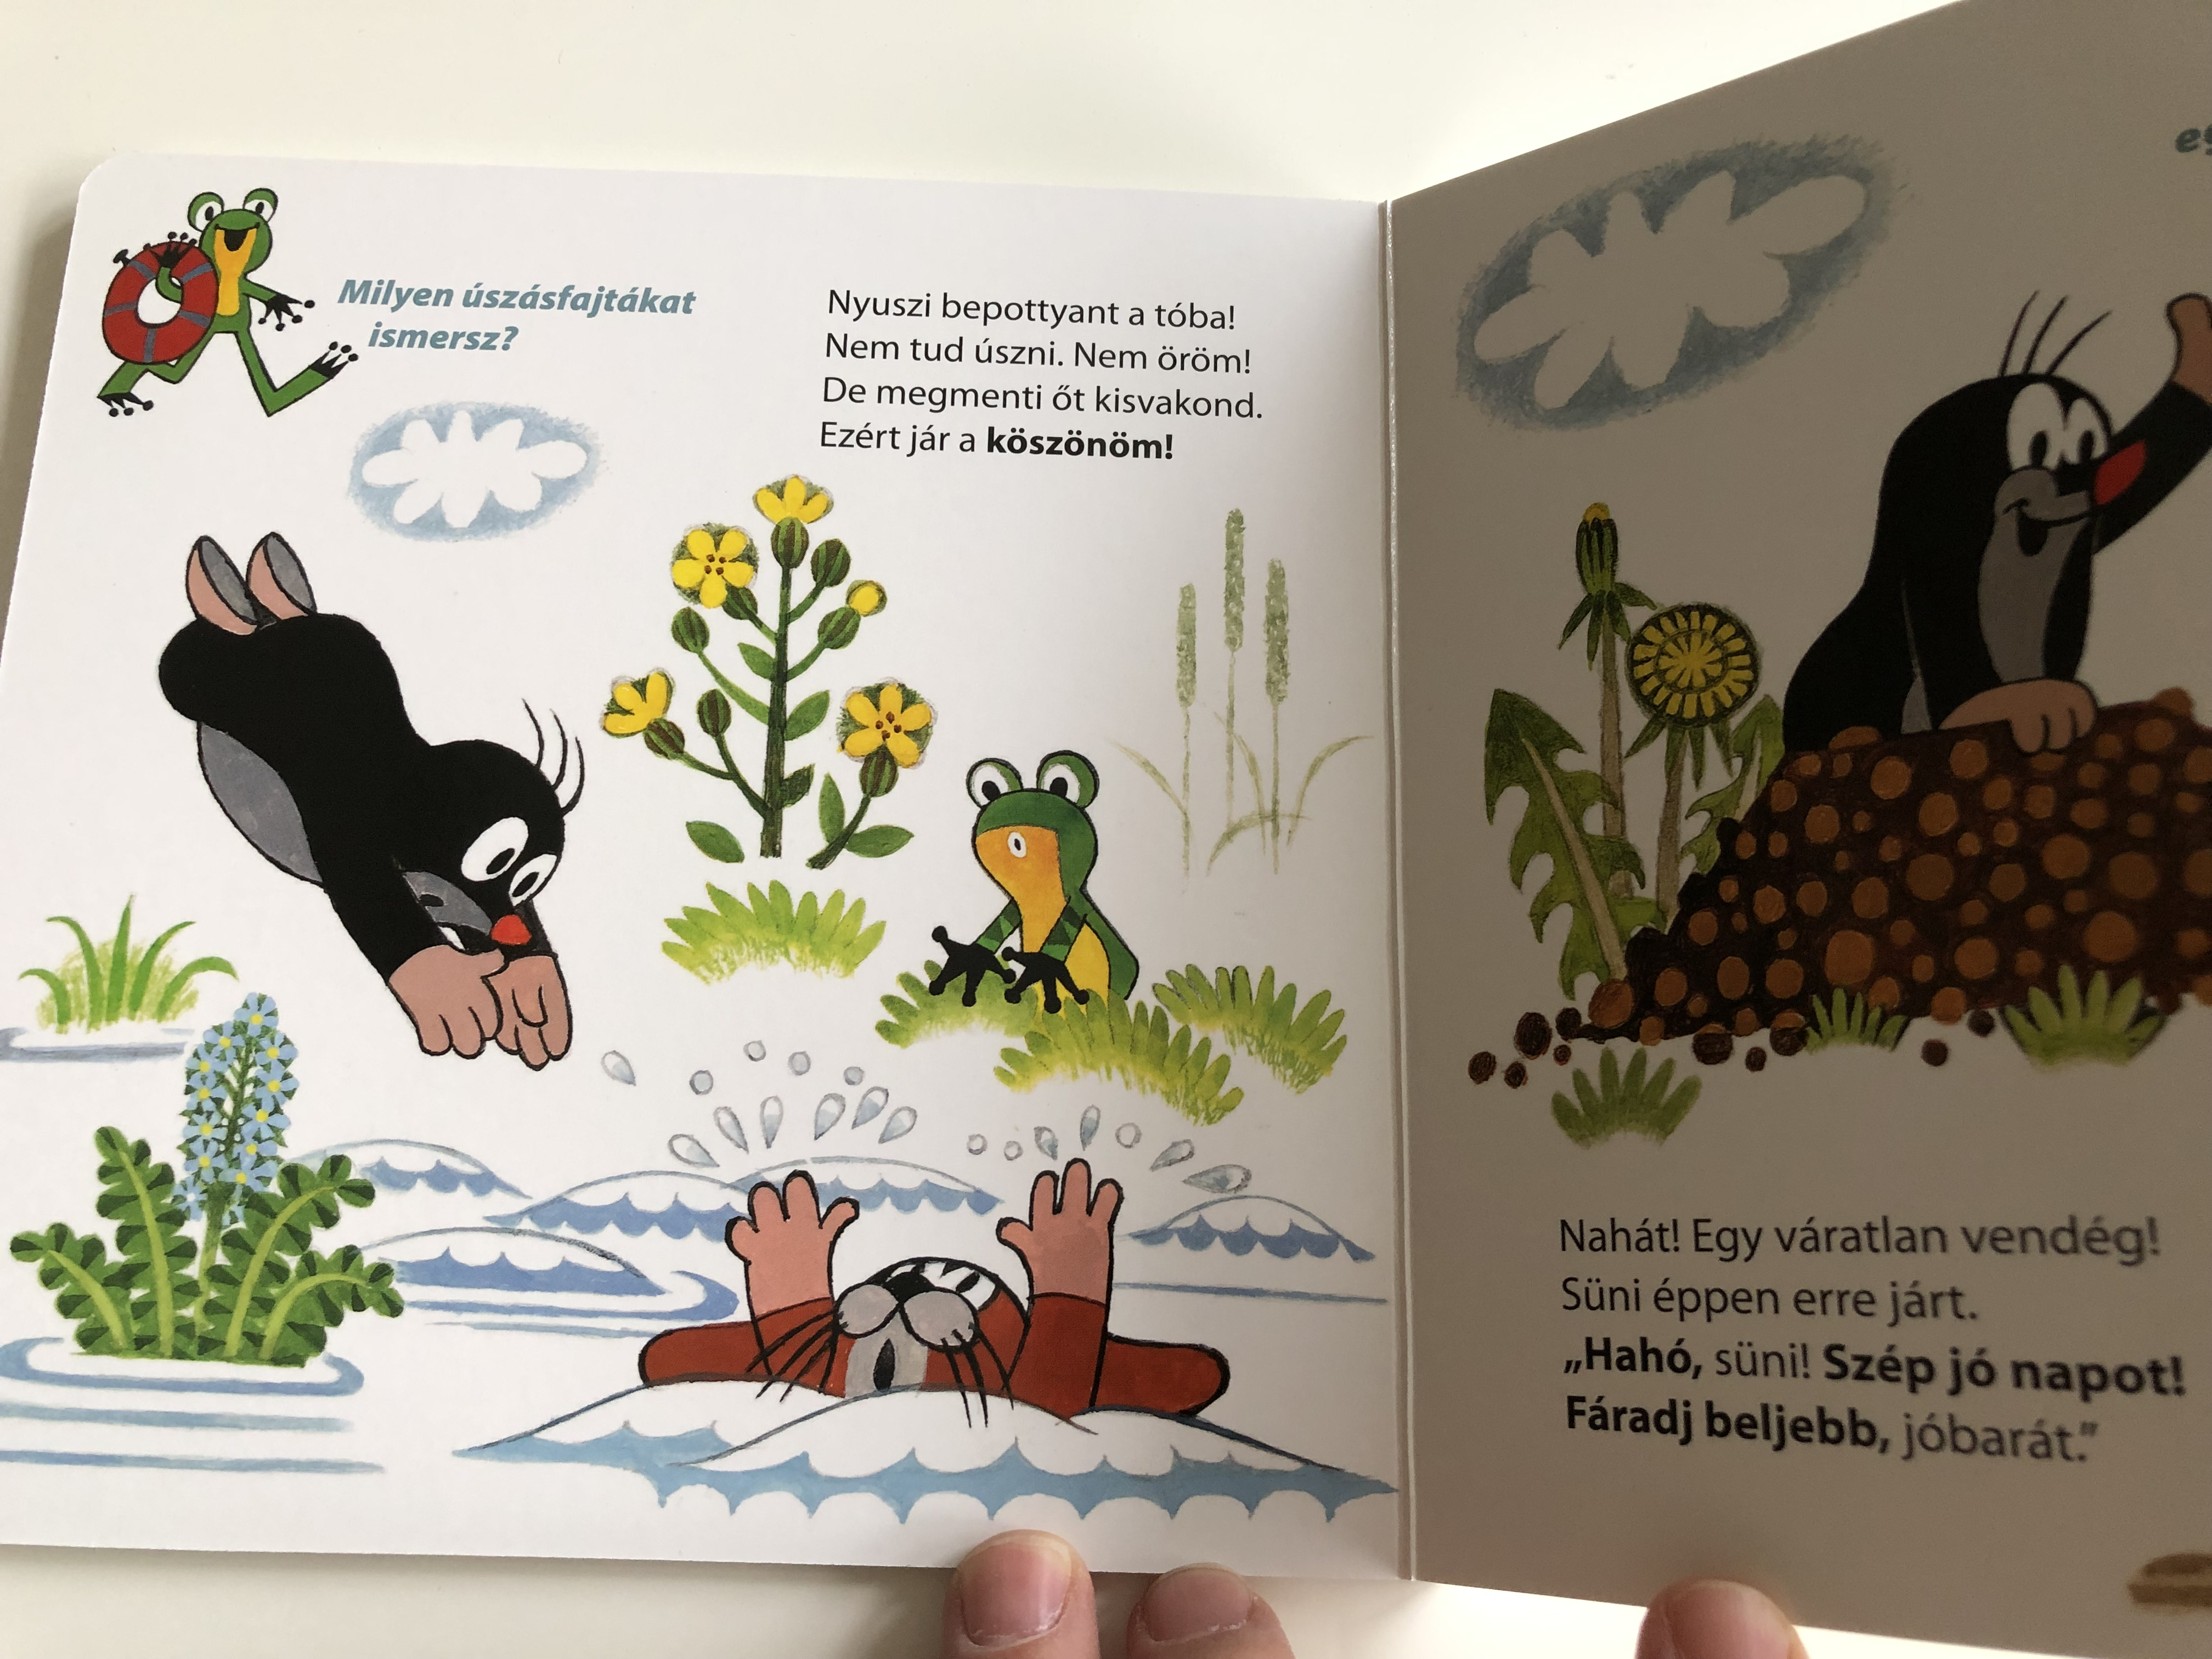 kisvakond-s-az-illem-krtek-and-politeness-author-zden-k-miler-with-the-poems-of-romh-nyi-gnes-hungarian-language-edition-book-for-children-4-.jpg